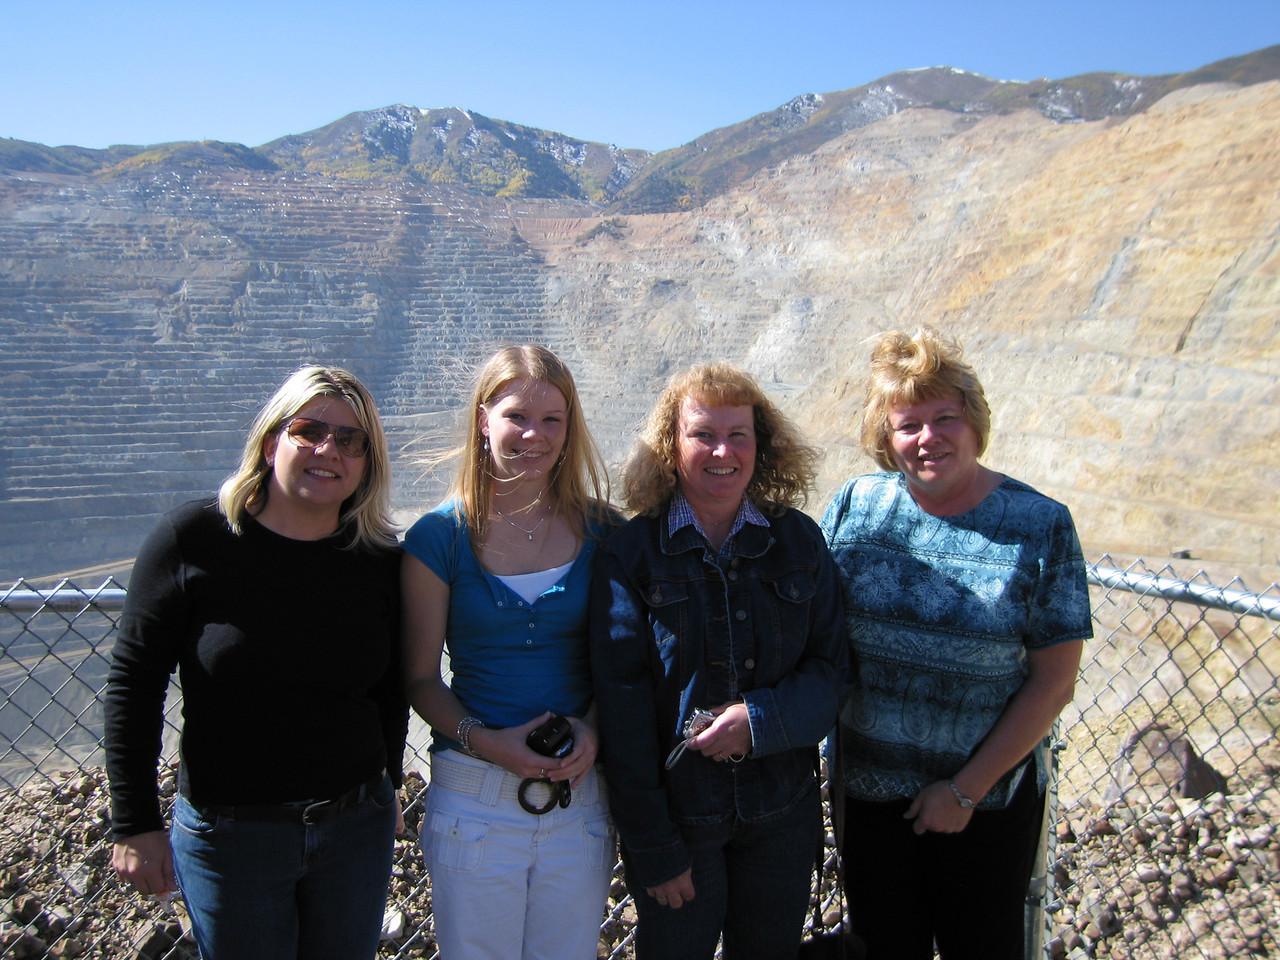 Ladies at the mine